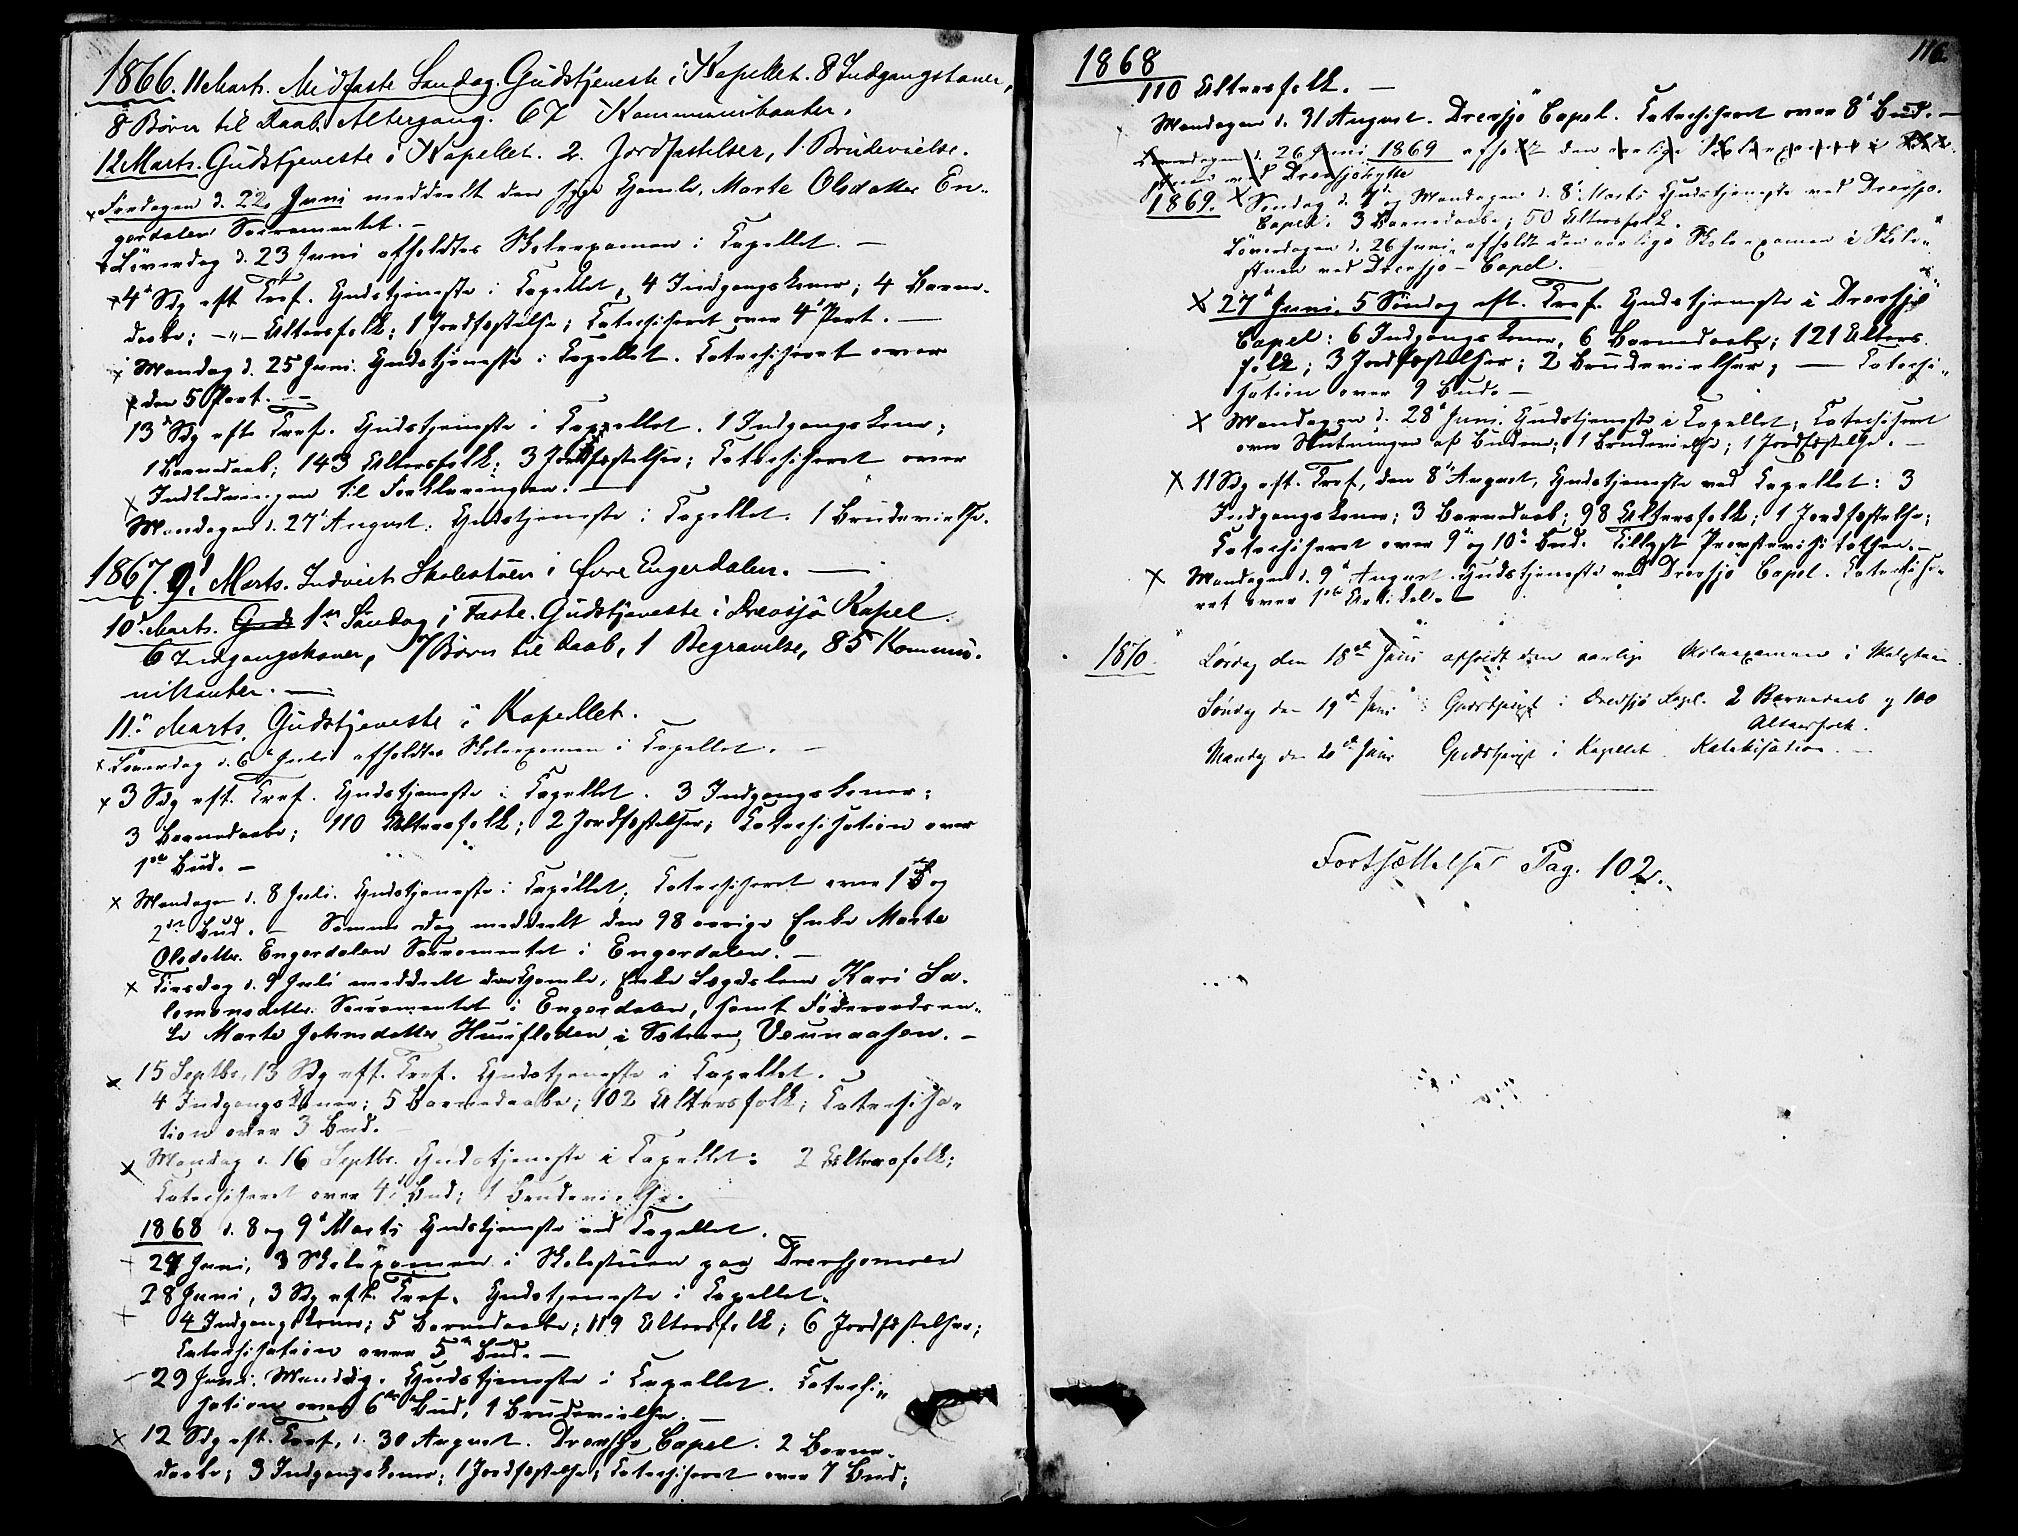 SAH, Rendalen prestekontor, H/Ha/Hab/L0002: Parish register (copy) no. 2, 1858-1880, p. 116